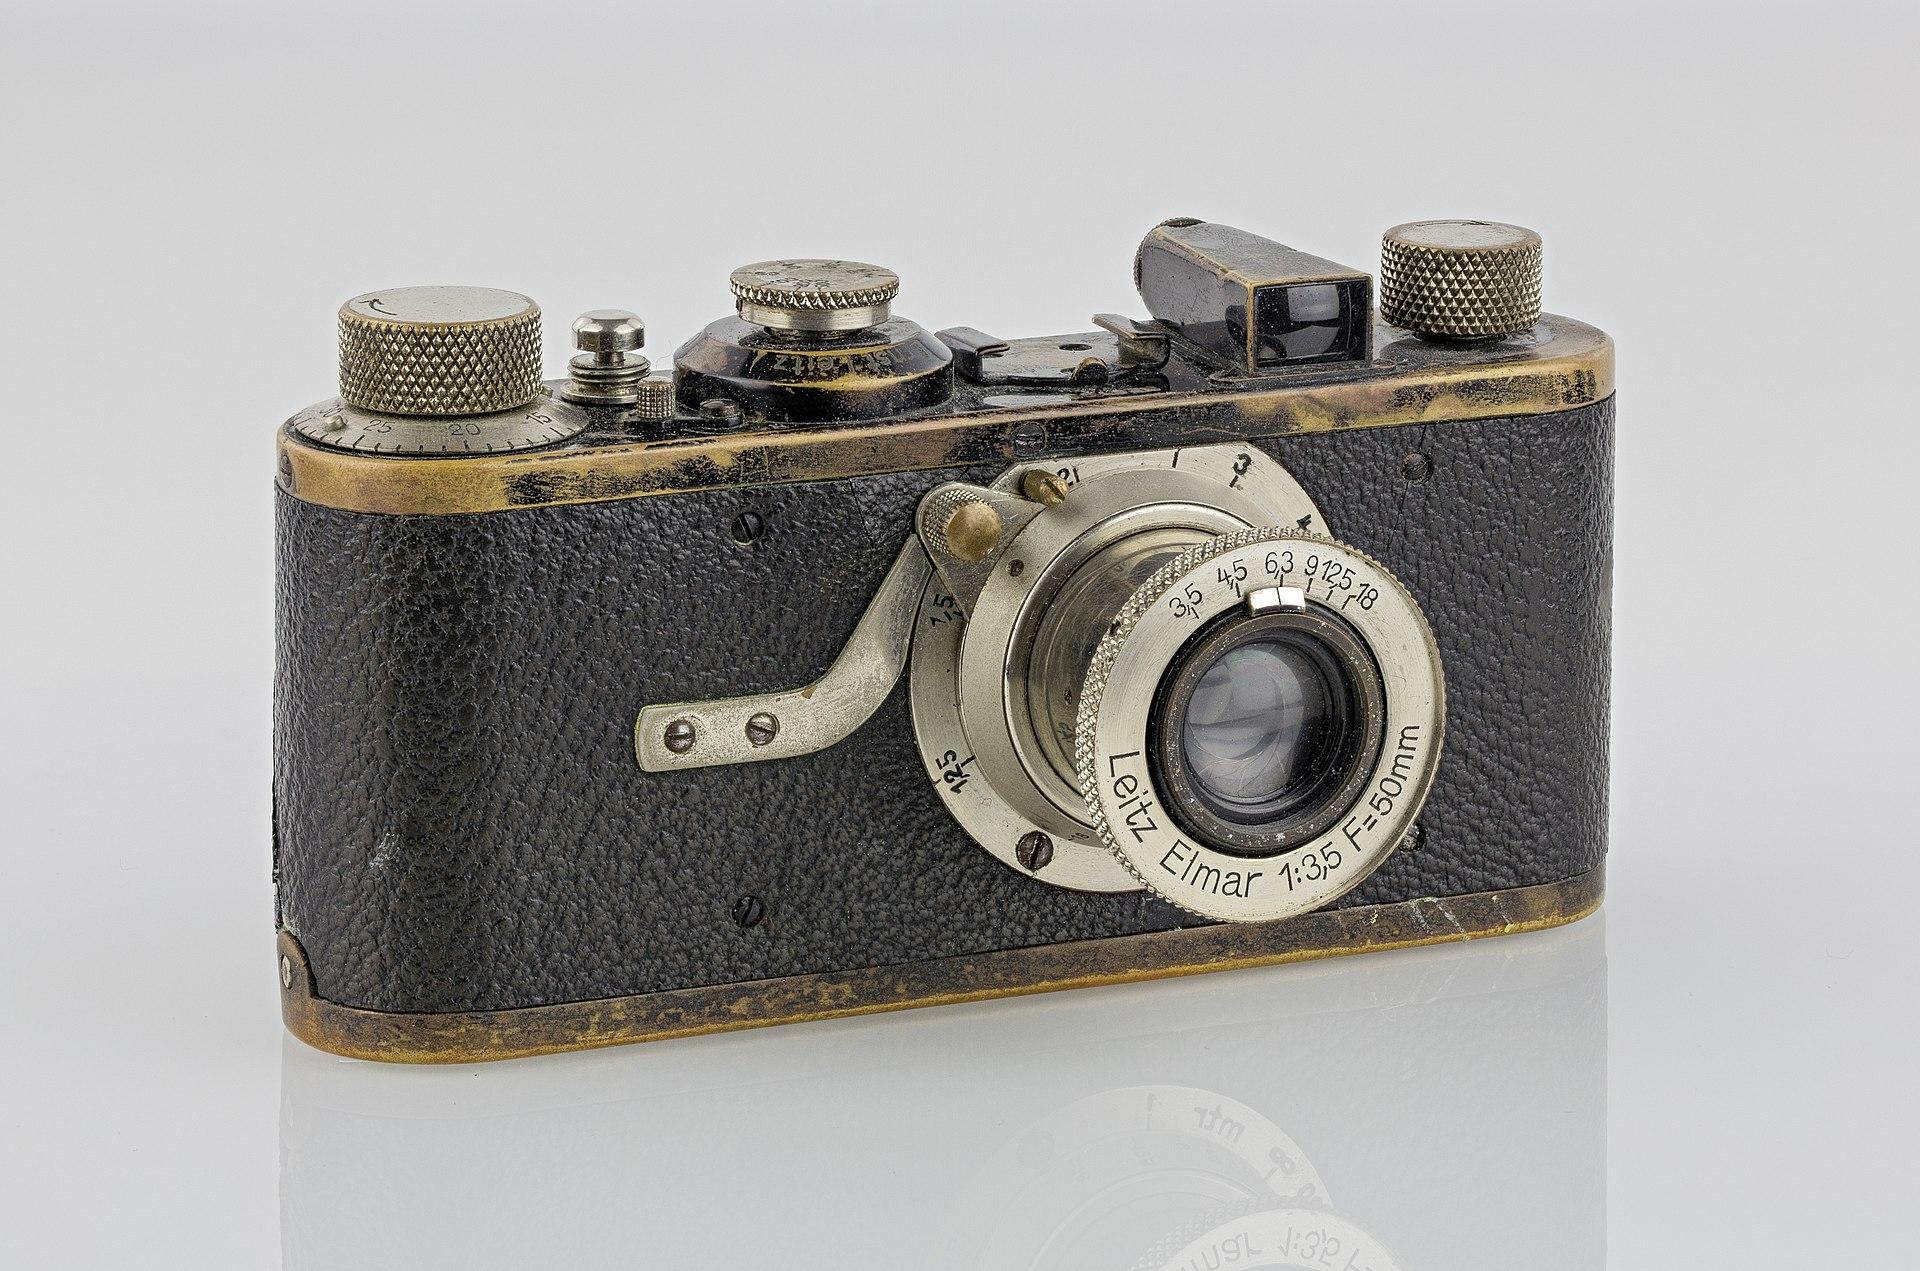 Leica camera (Pic: Kameraprojekt Graz 2015/Wikimedia Commons)